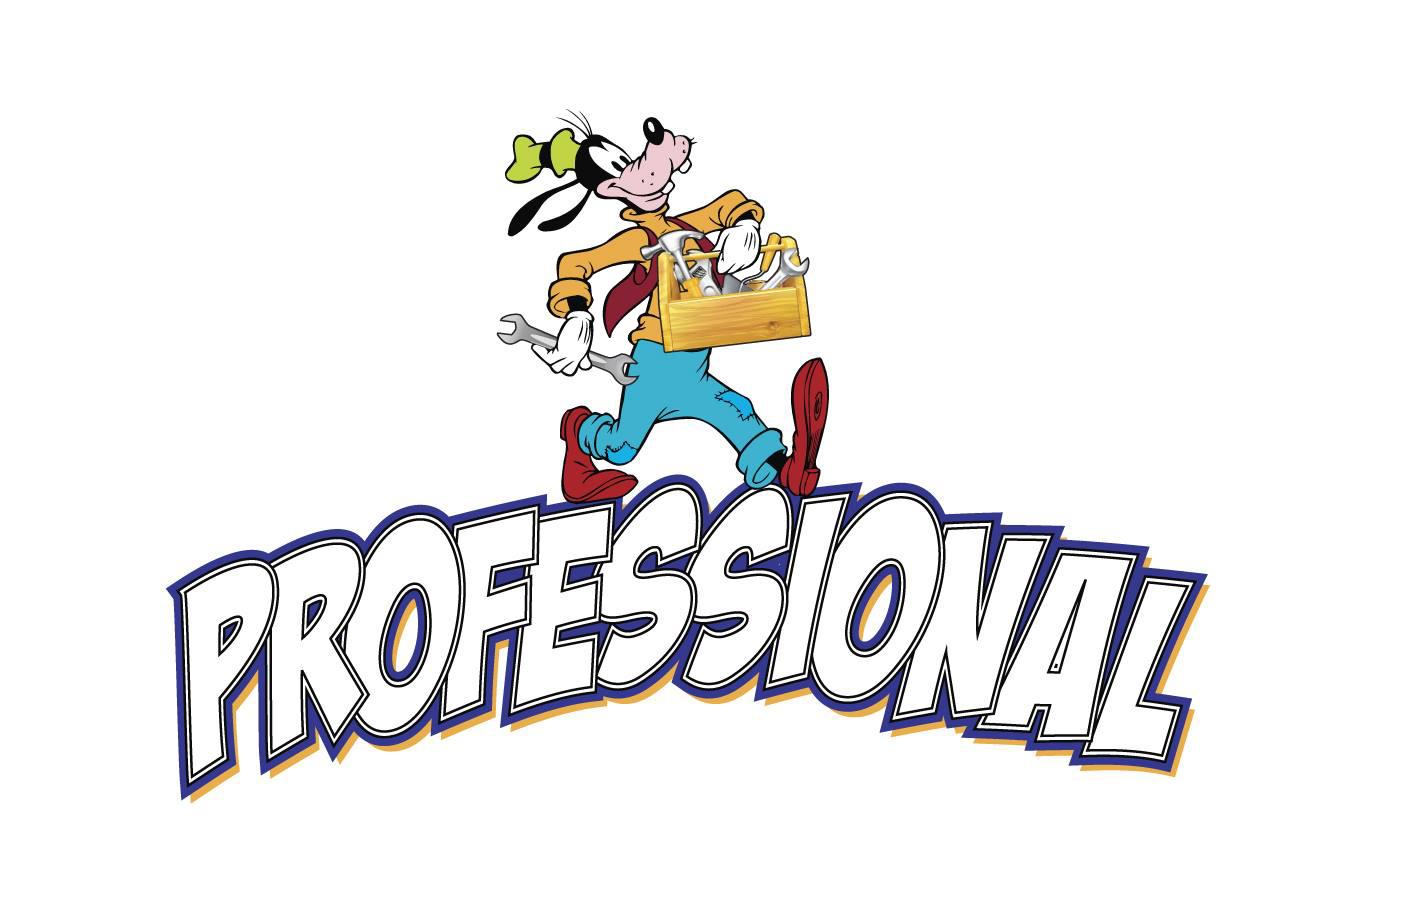 Šilja professional